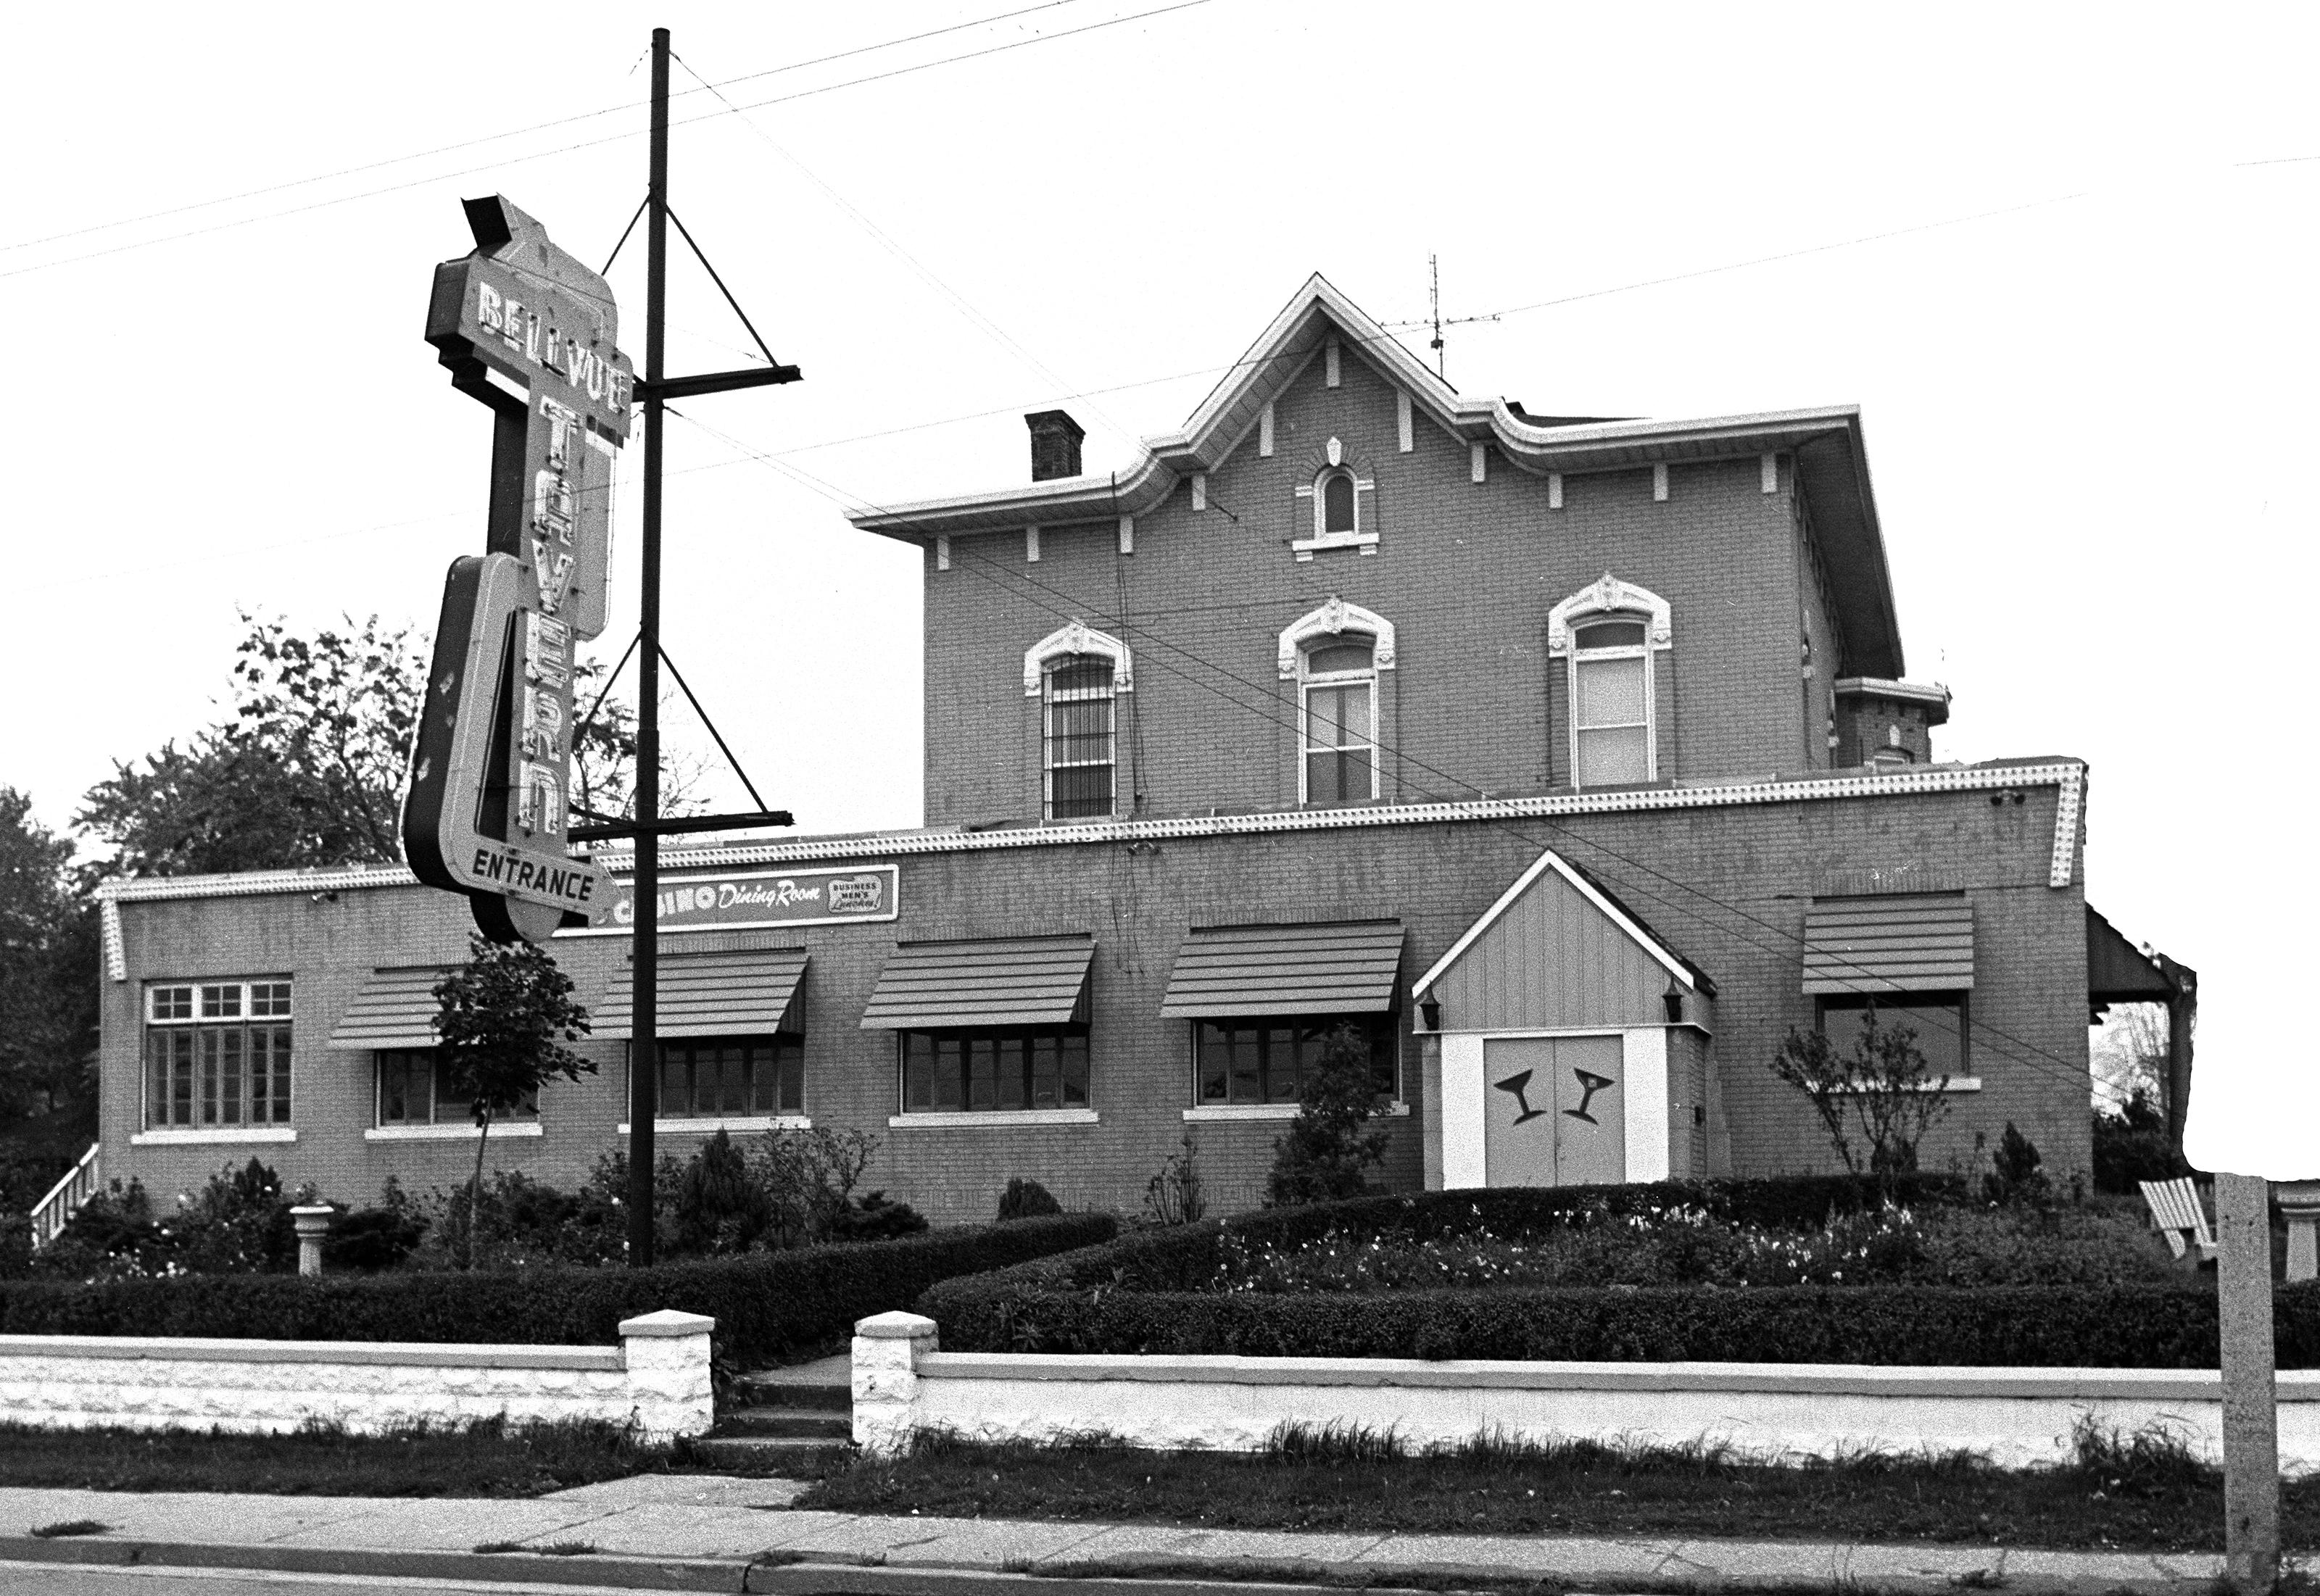 Bellevue Hotel, 1957